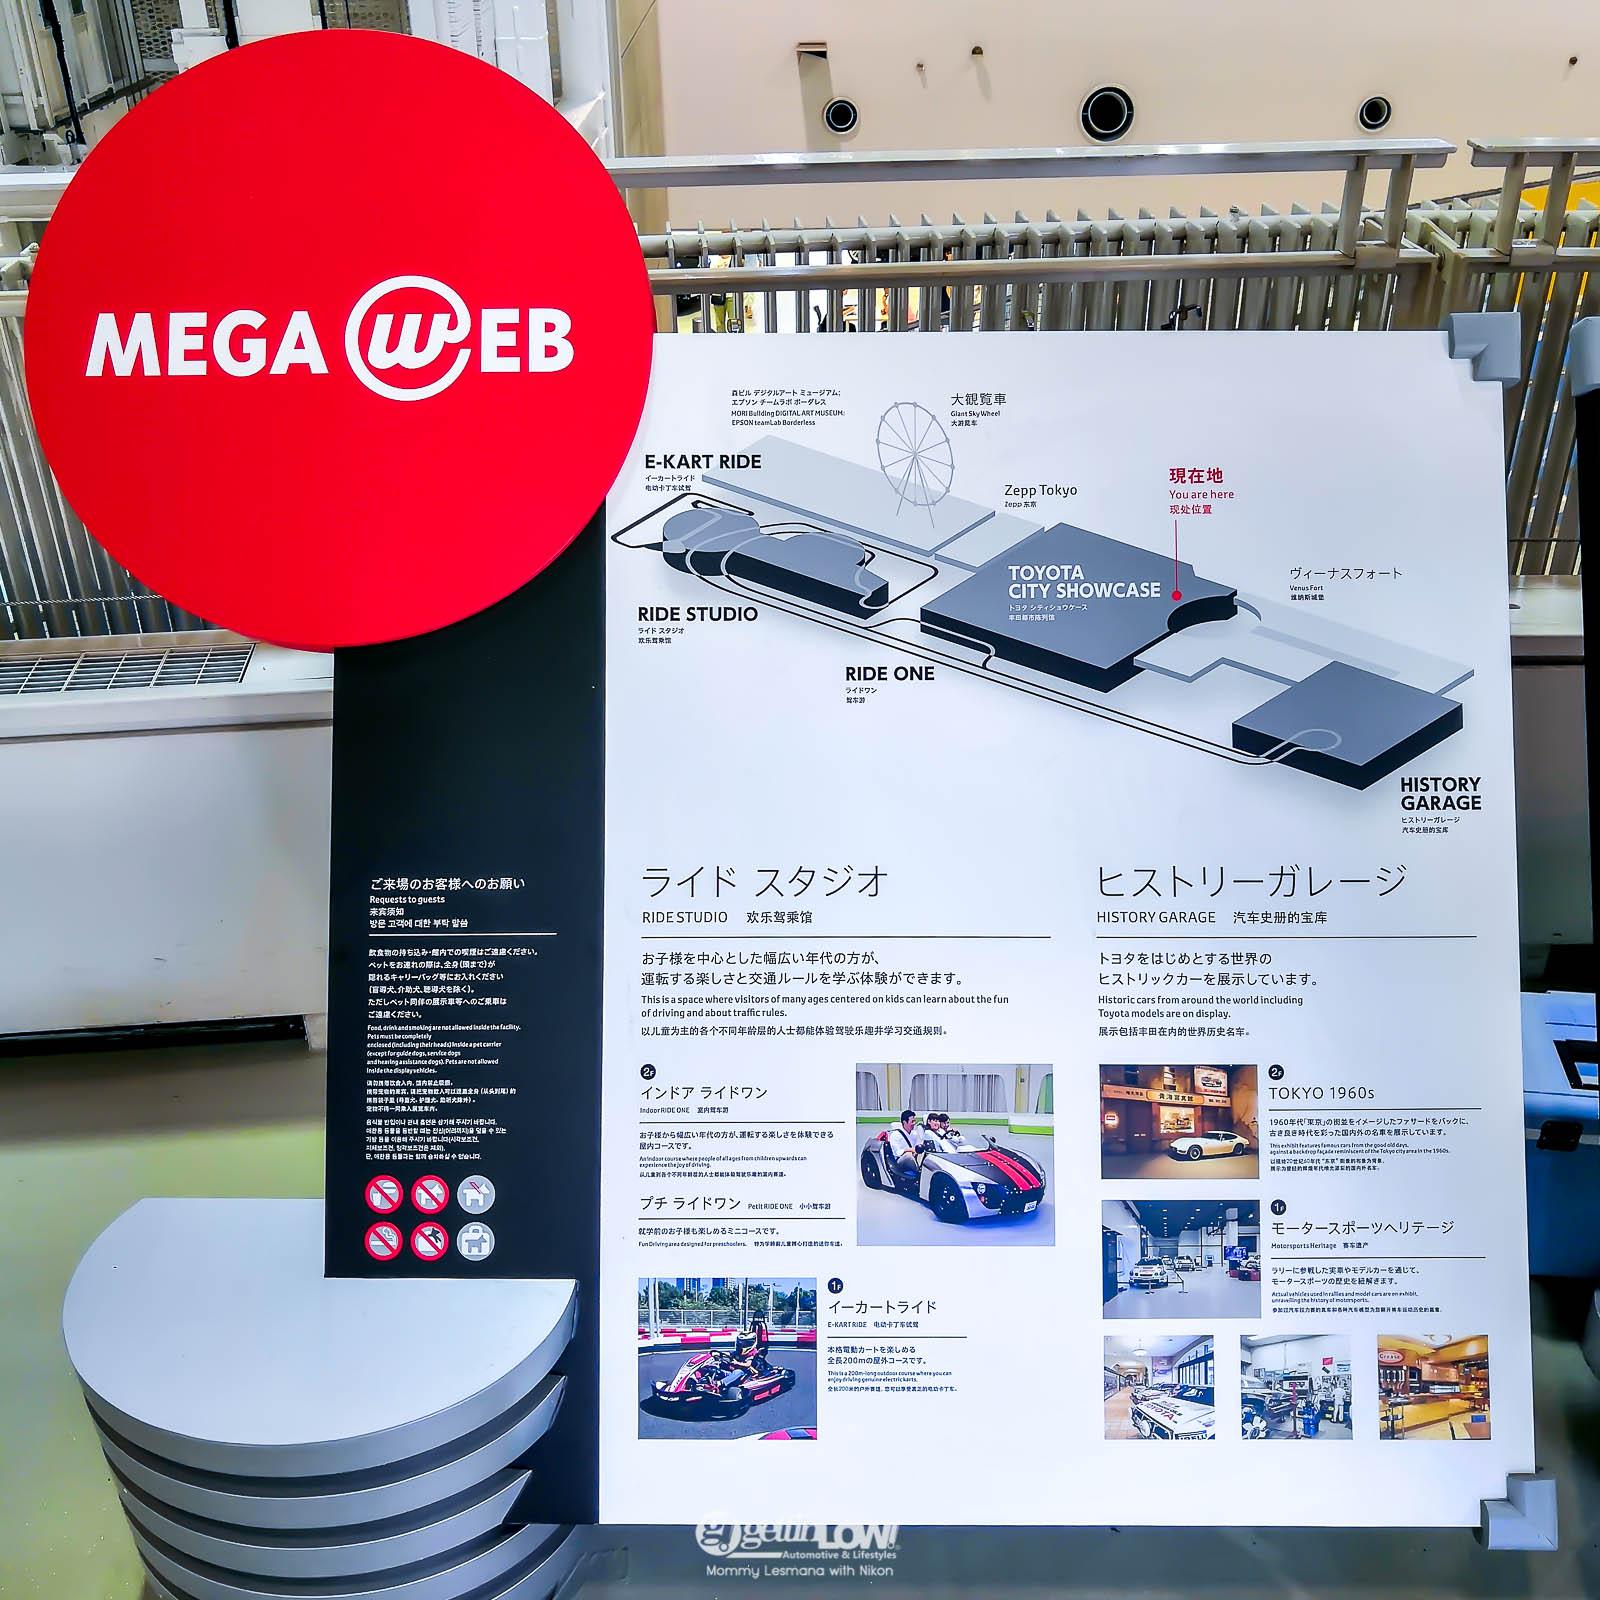 megaweb-odaiba-1